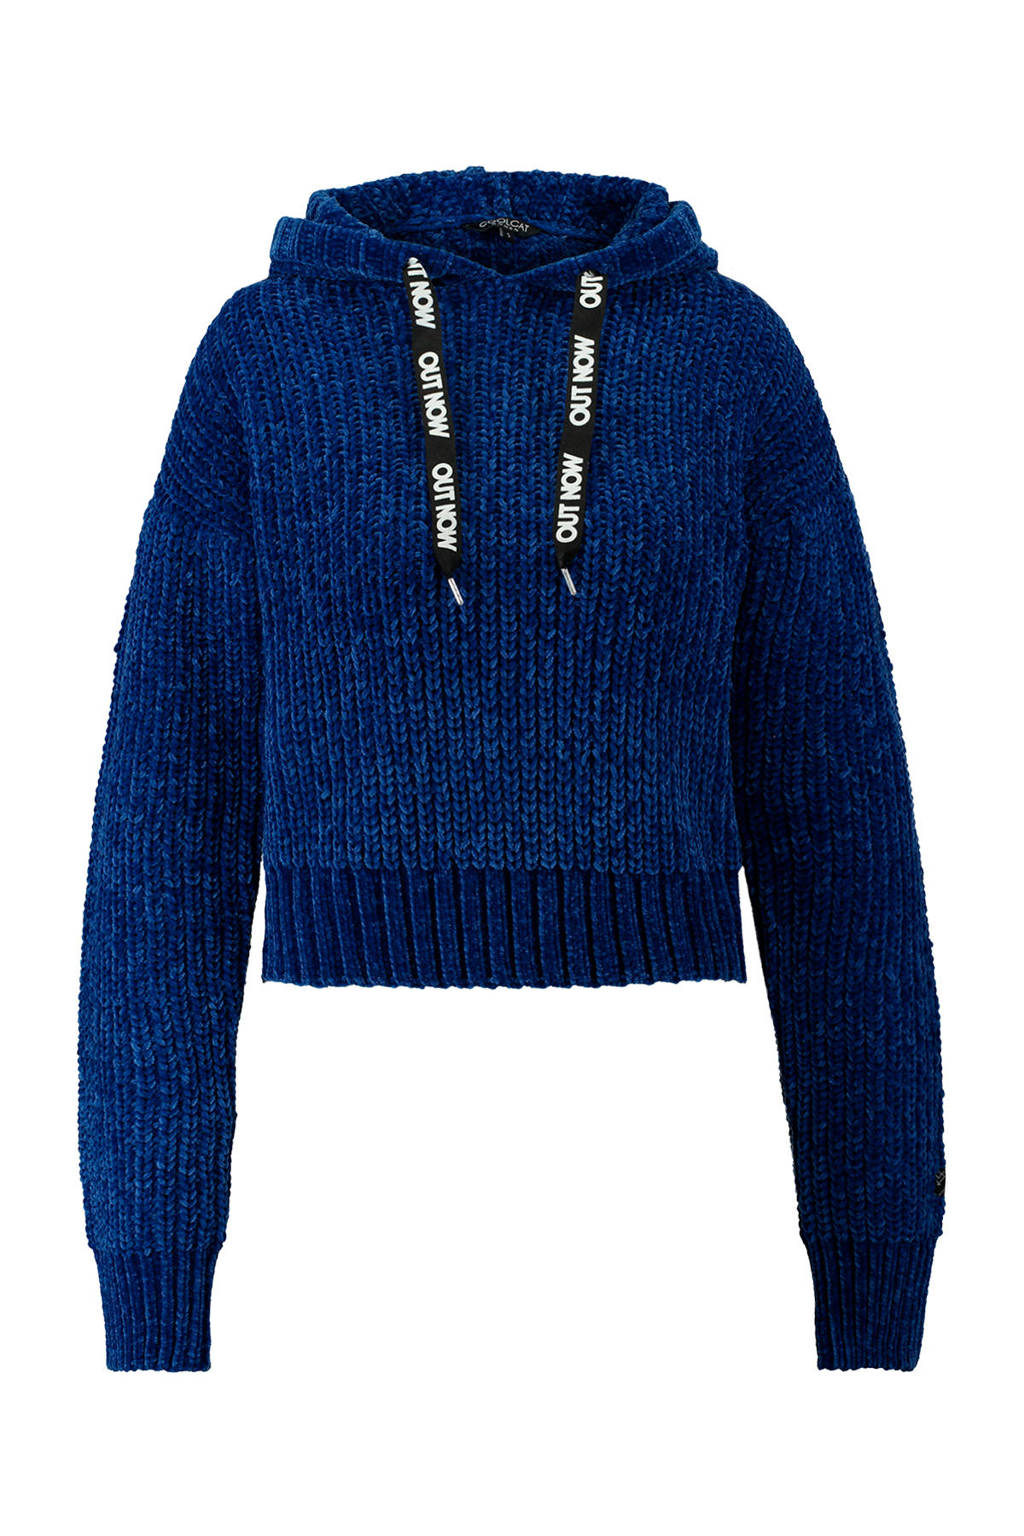 CoolCat trui blauw, Blauw